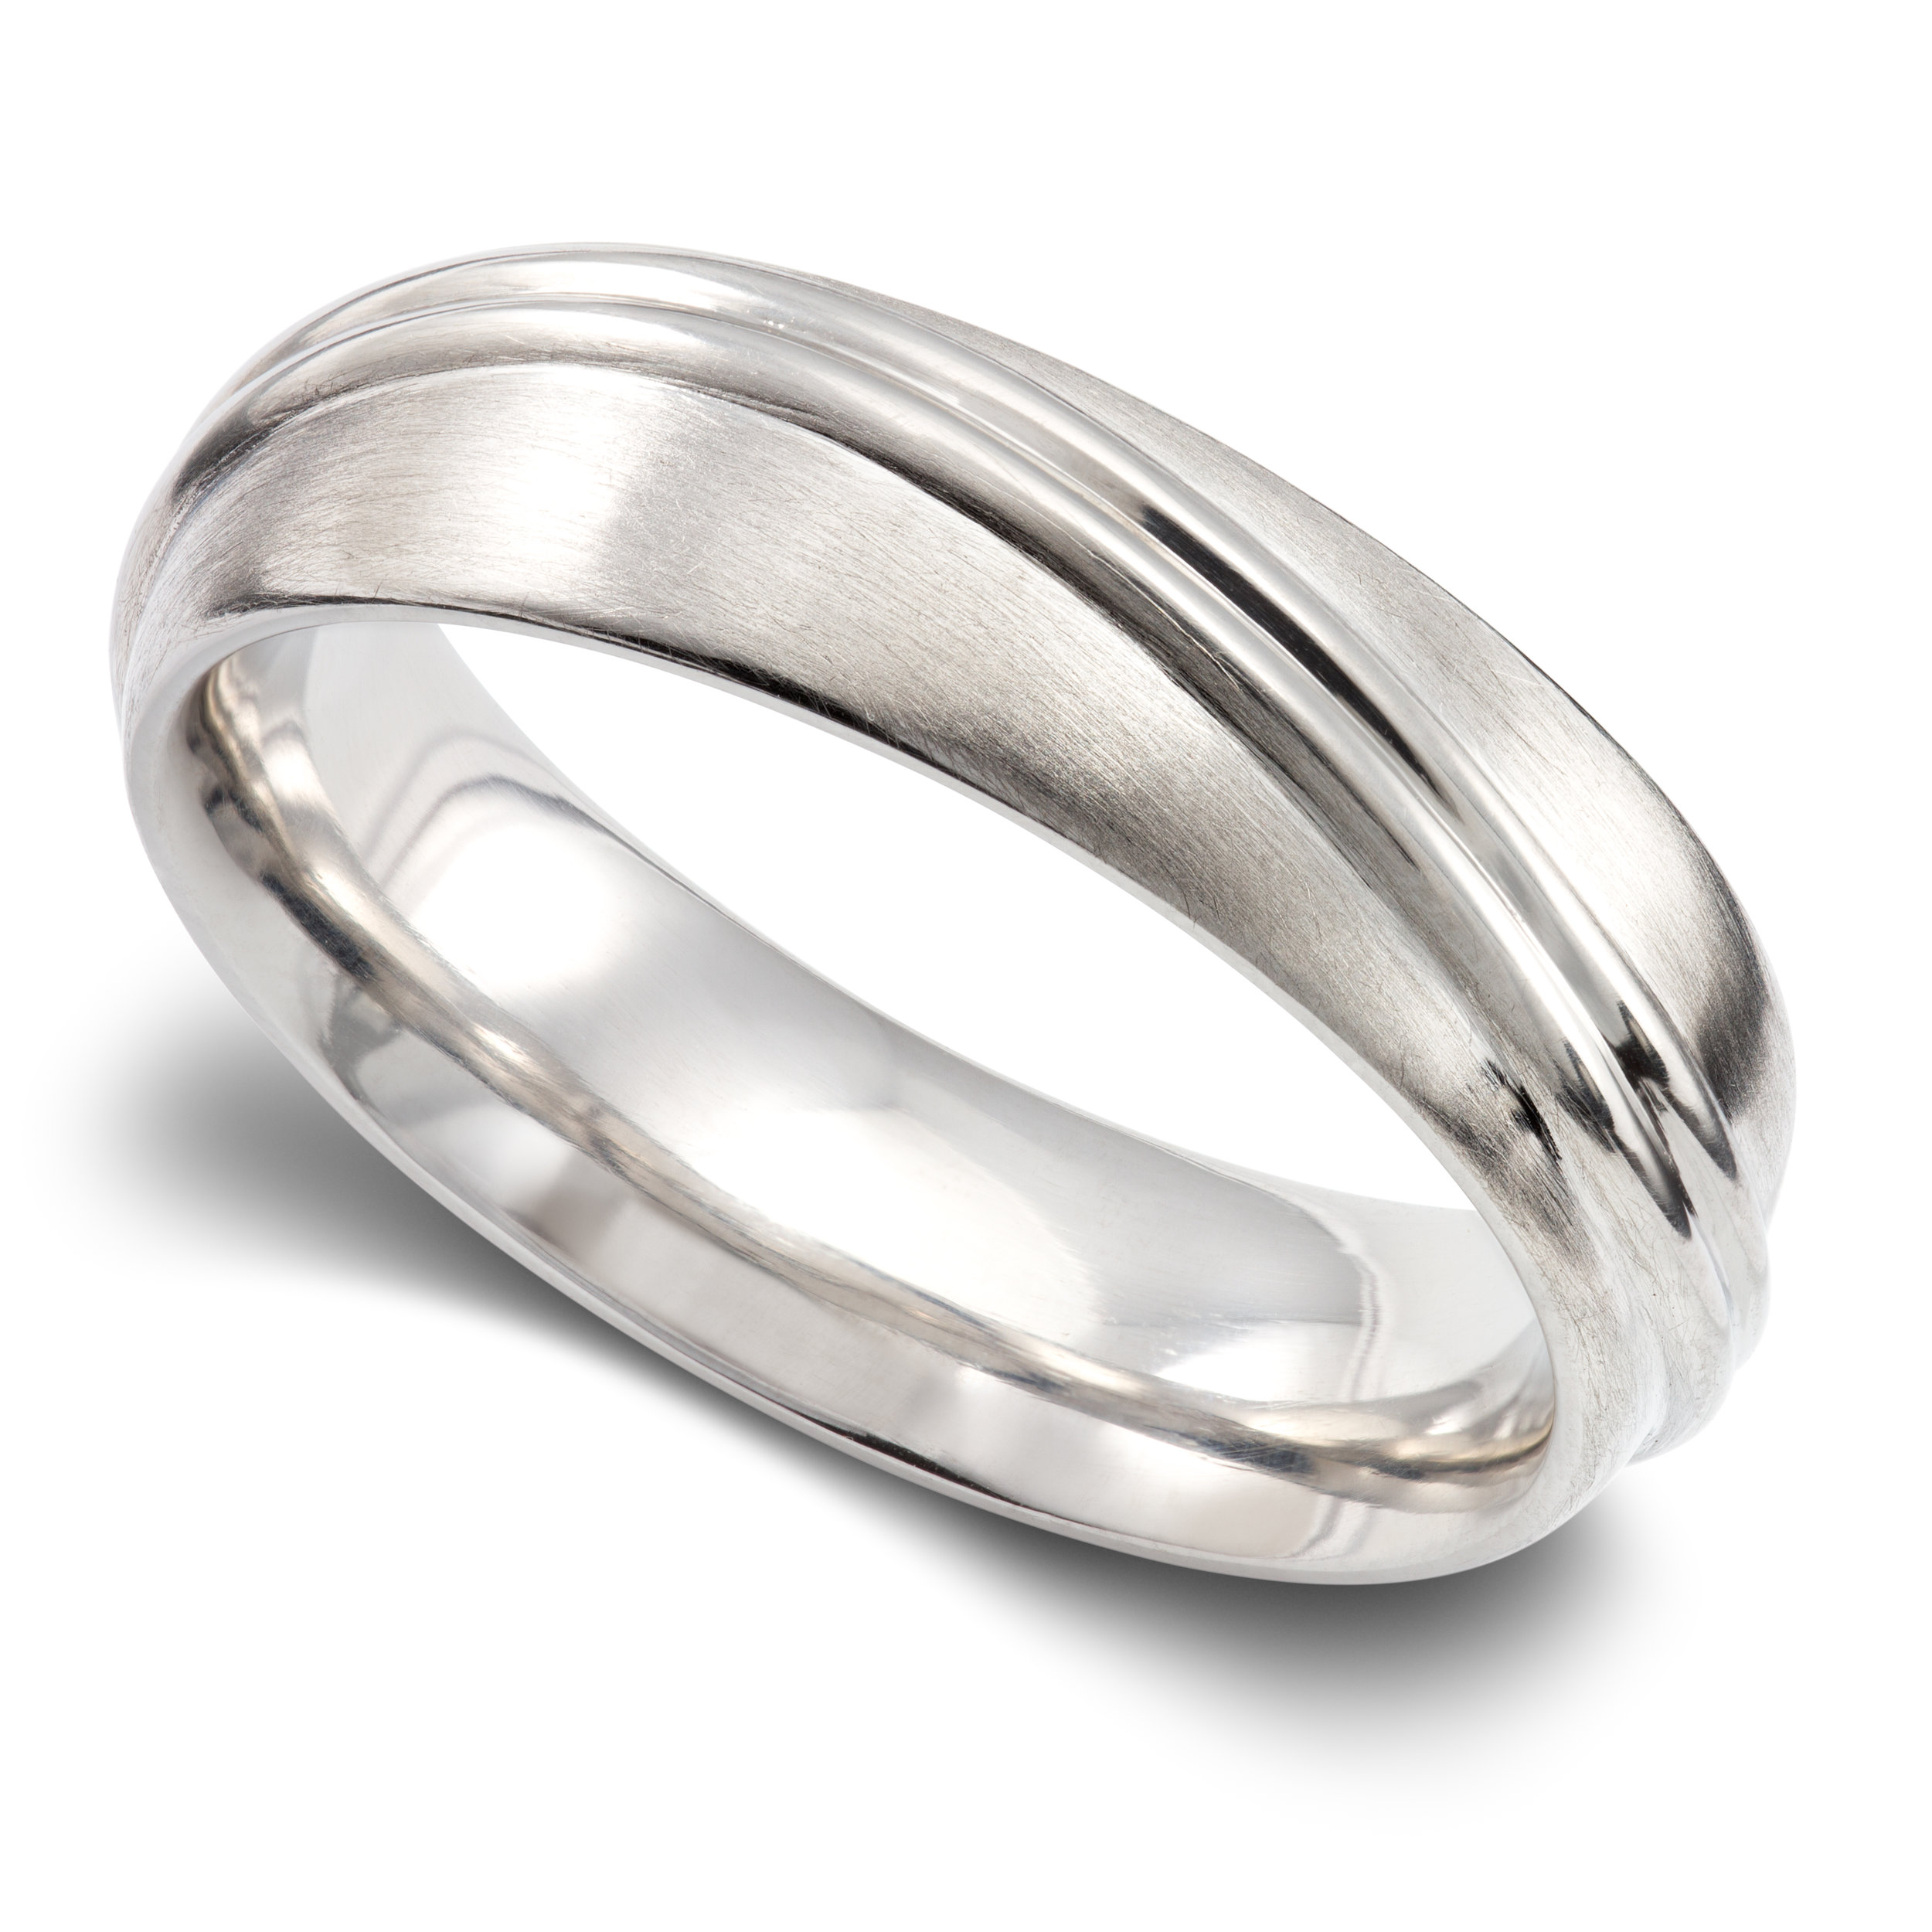 Platinum gents wedding ring - £2,349